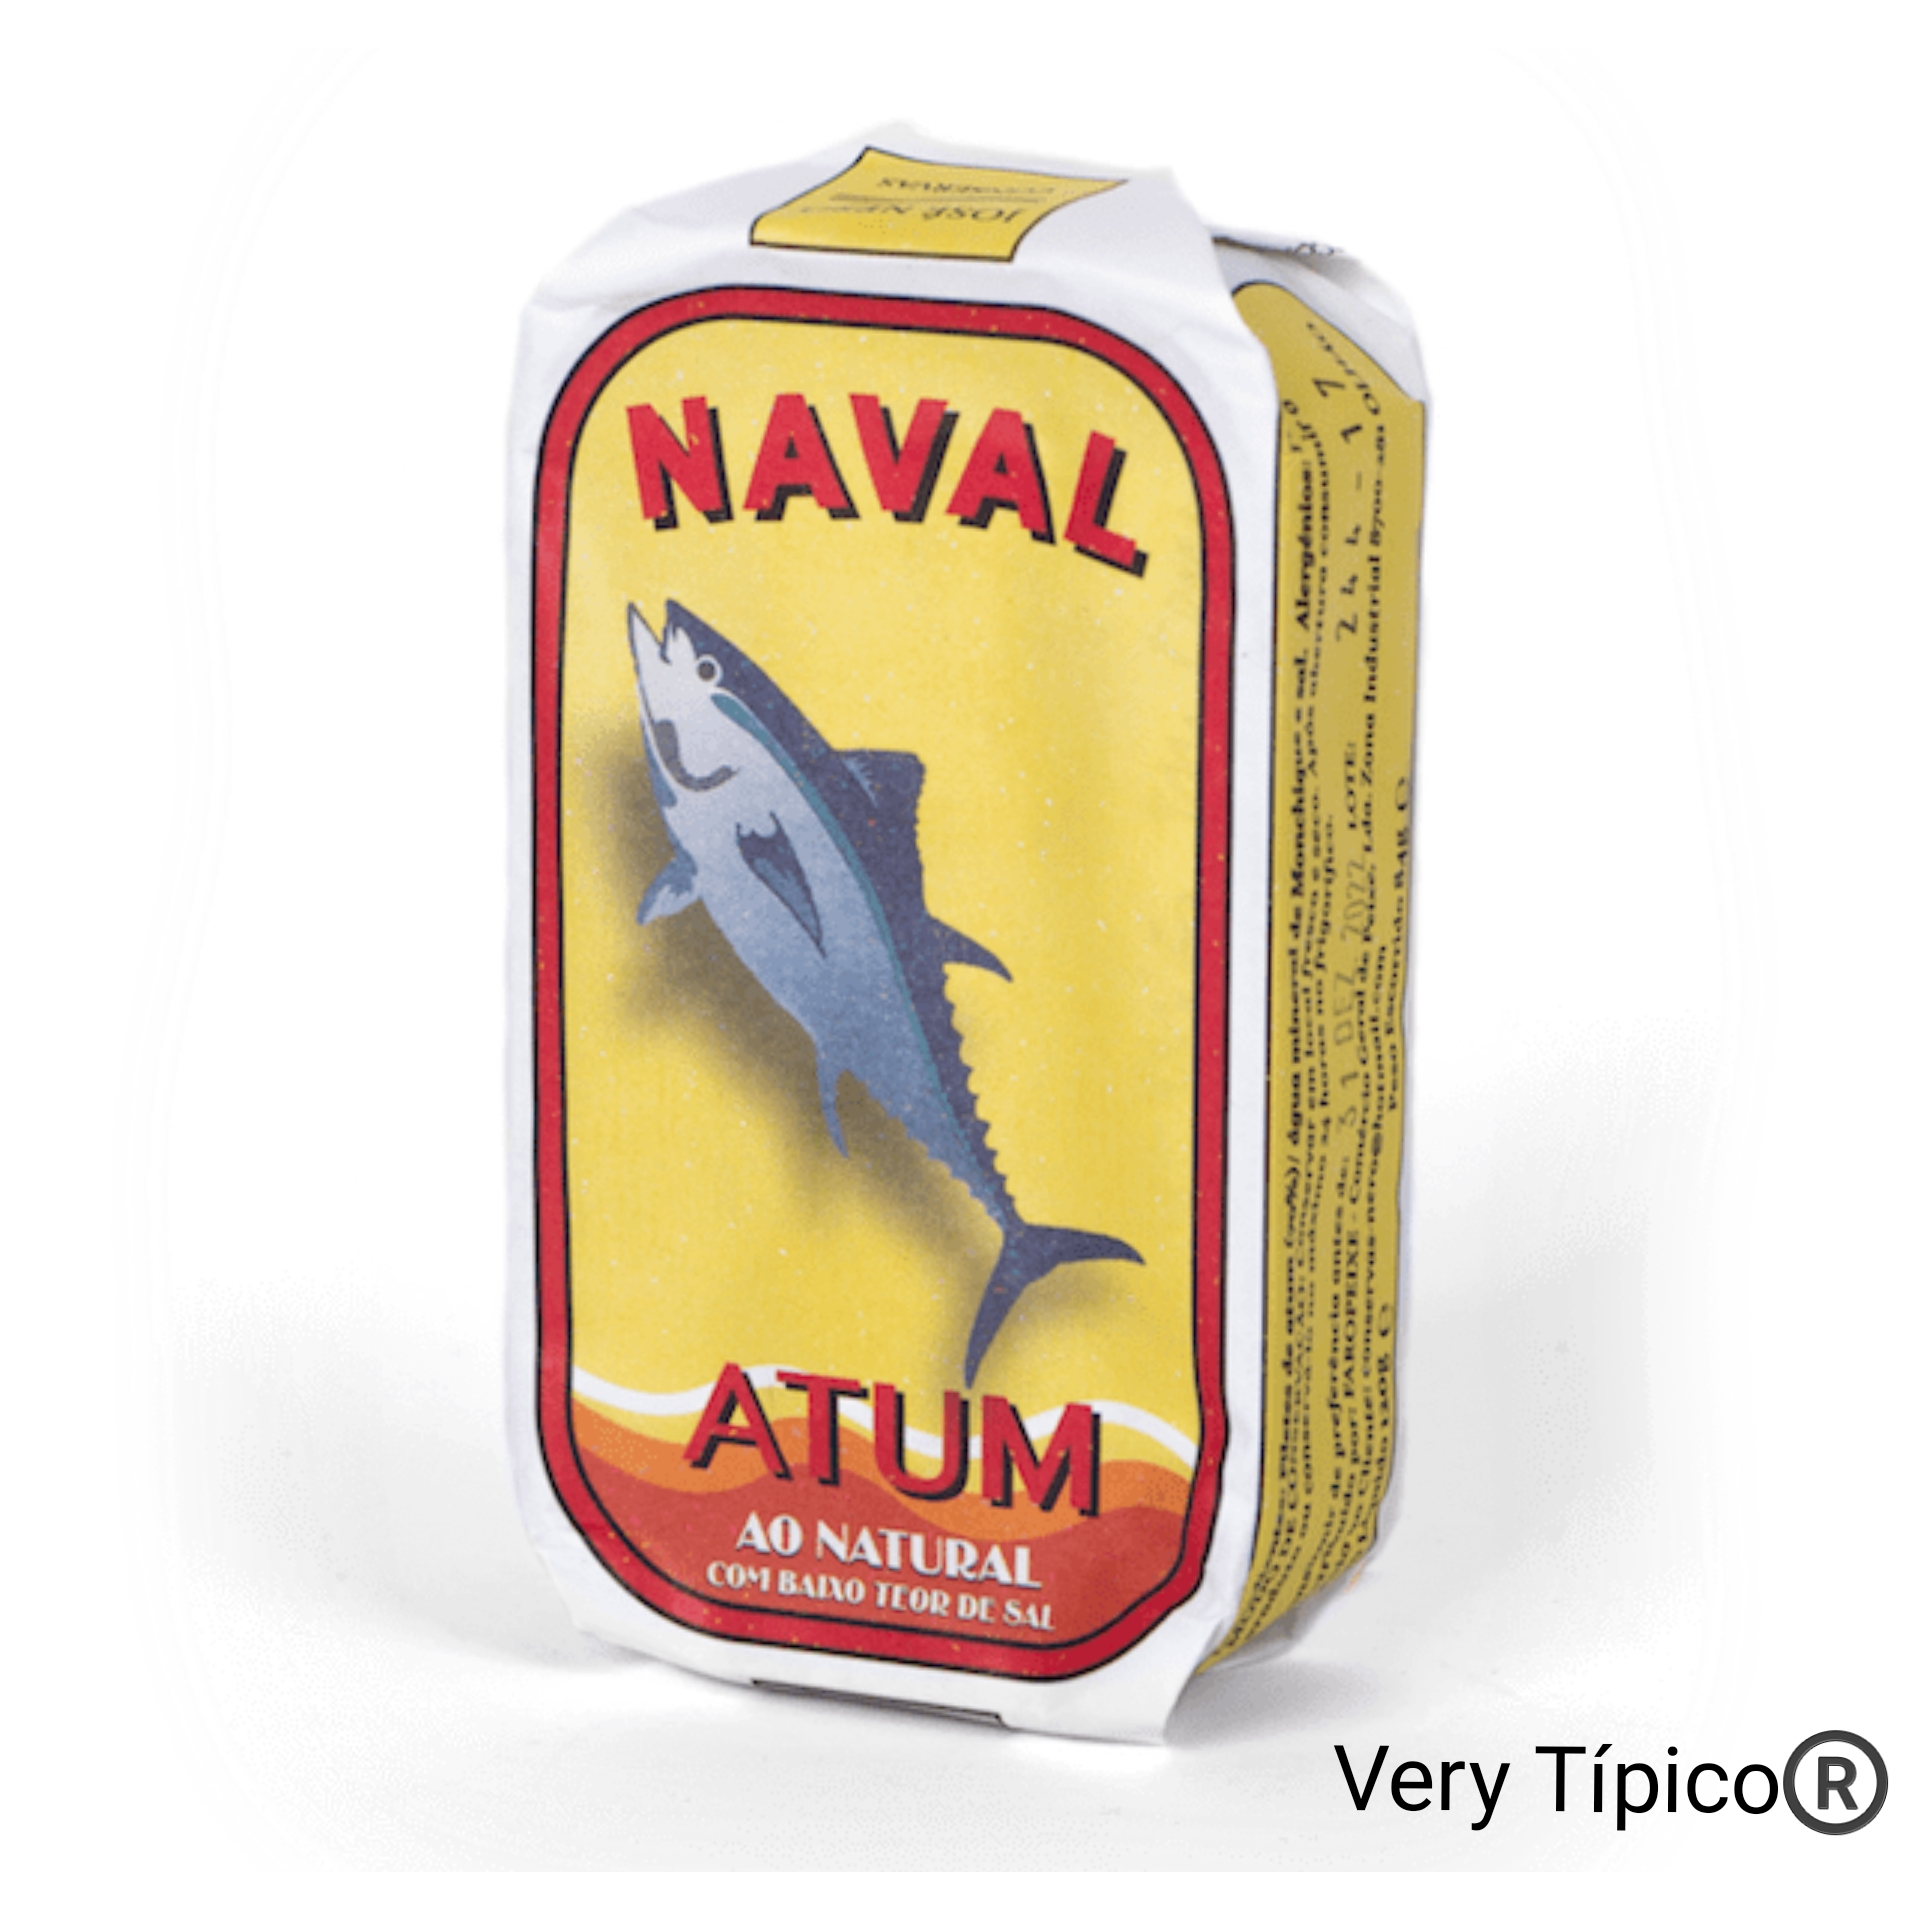 Filetes de Atum ao Natural com baixo teor de sal - Natural Tuna fillets with low salt